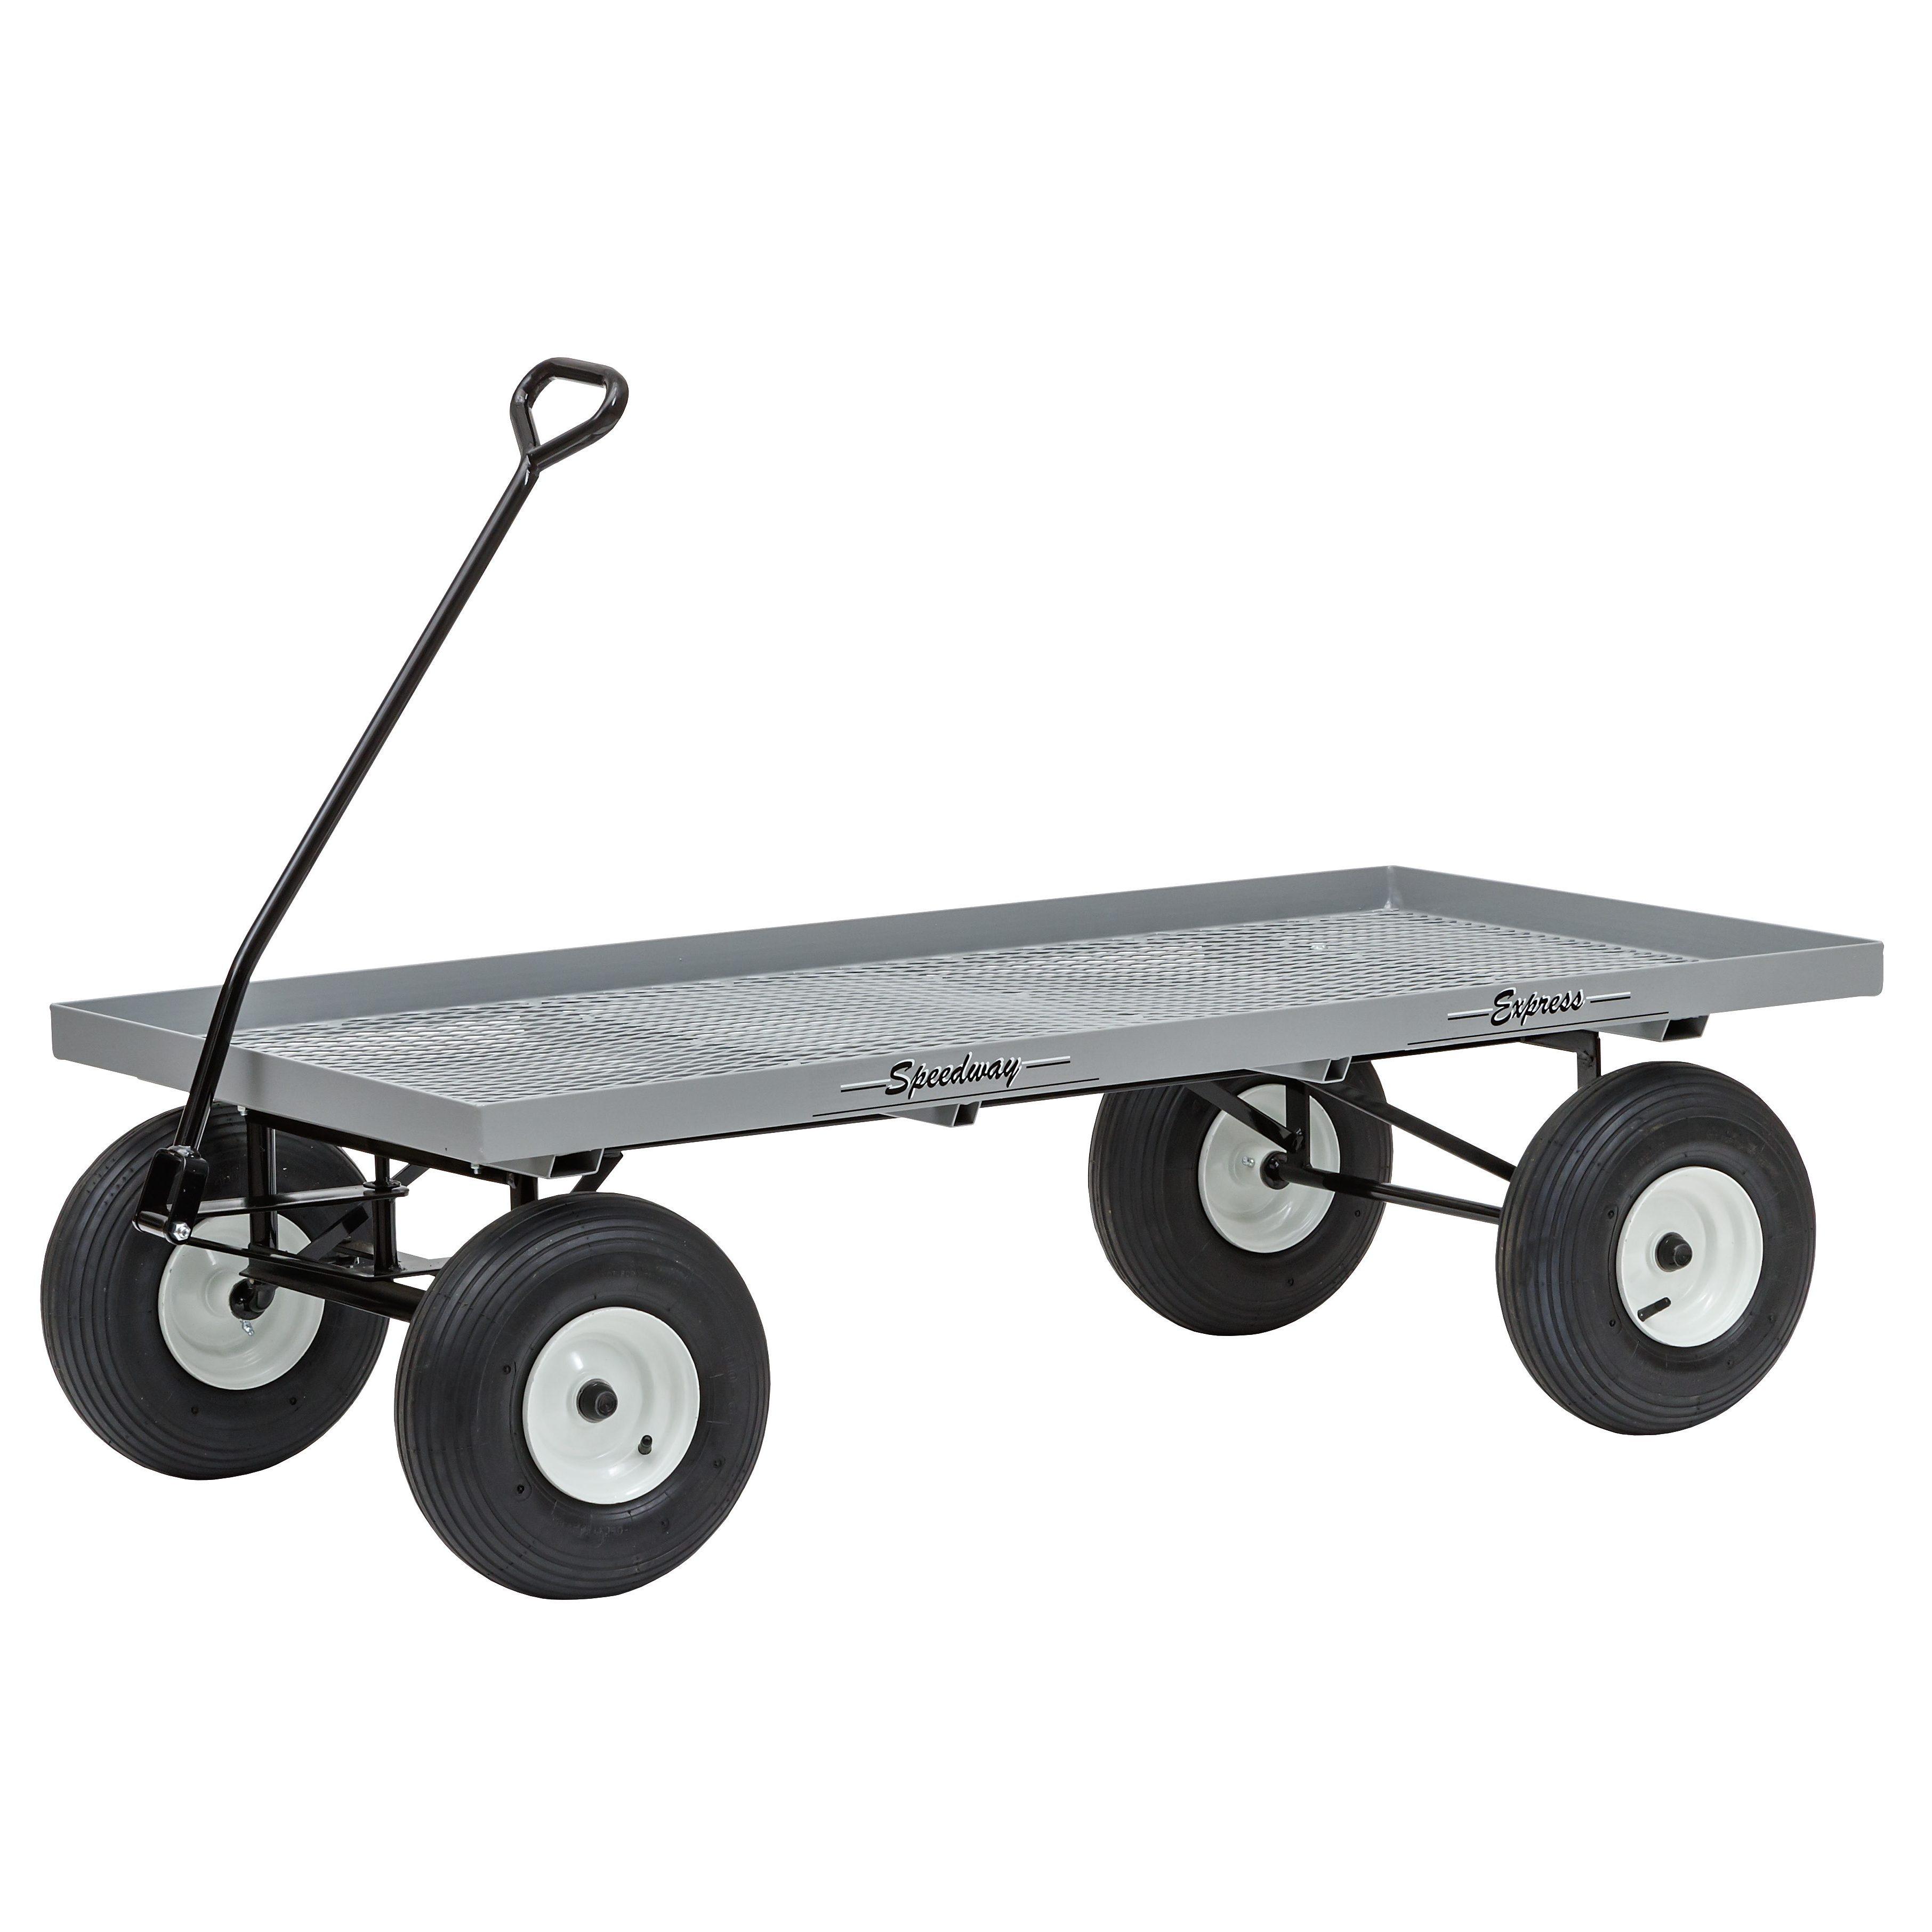 Speedway Express Heavy Duty Farm Wagon Lapp Wagons